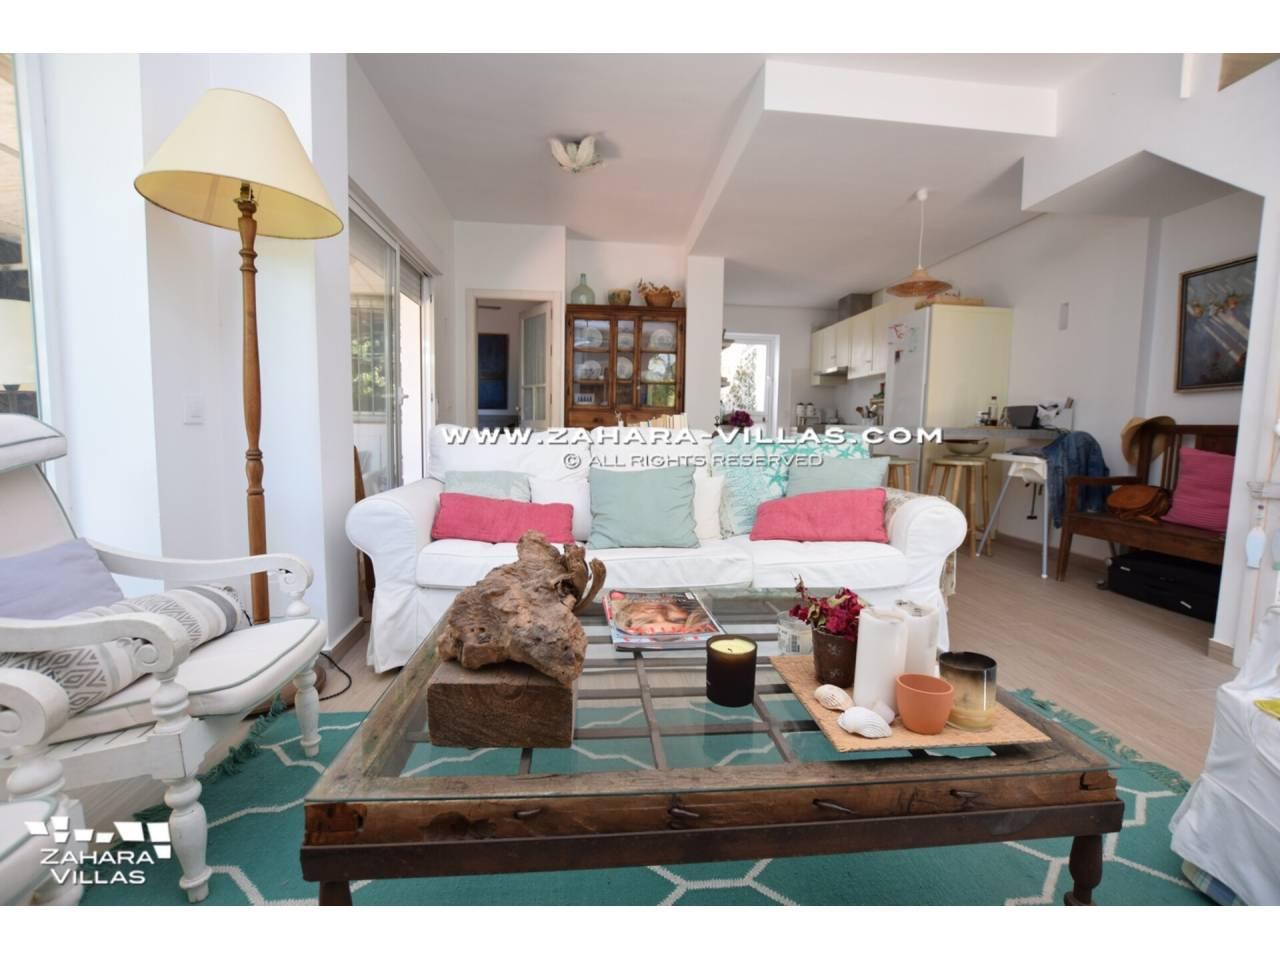 Imagen 13 de House for sale close to the beach, with sea views in Zahara de los Atunes